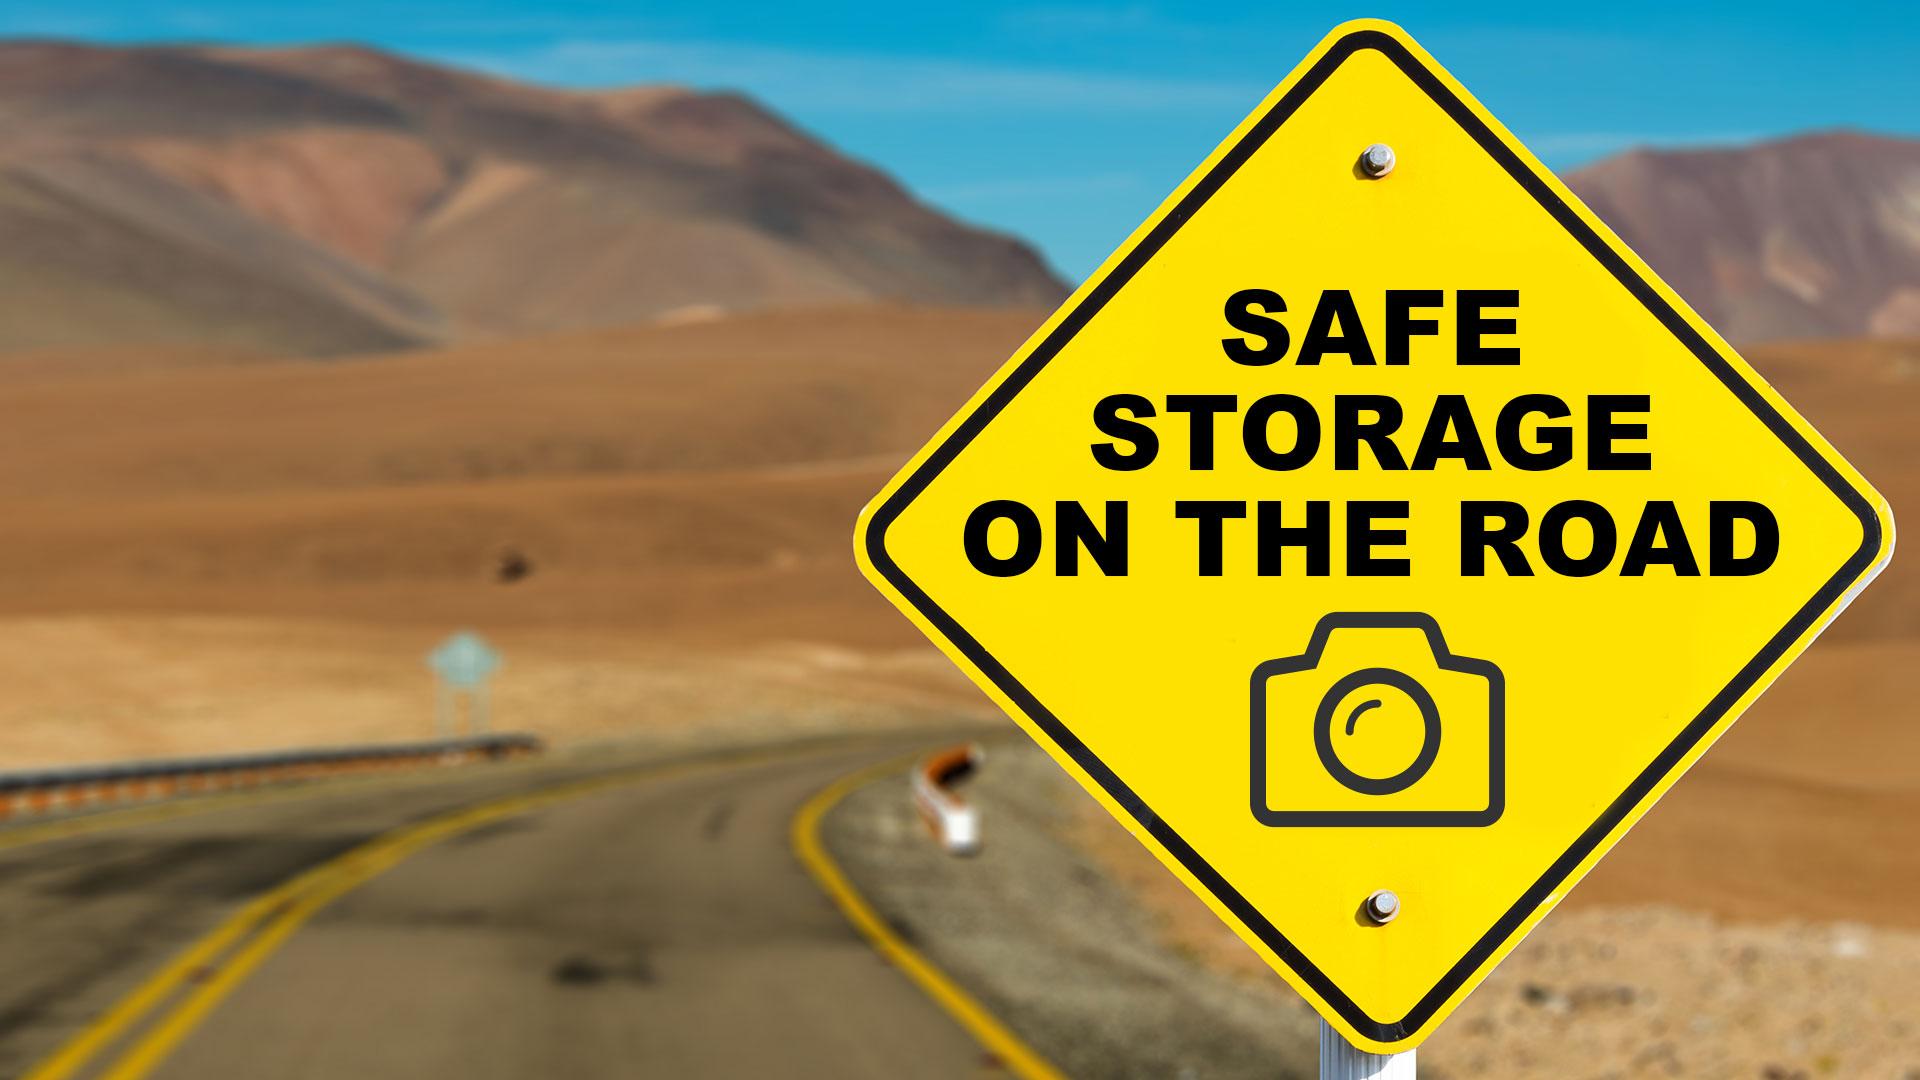 safe_storage